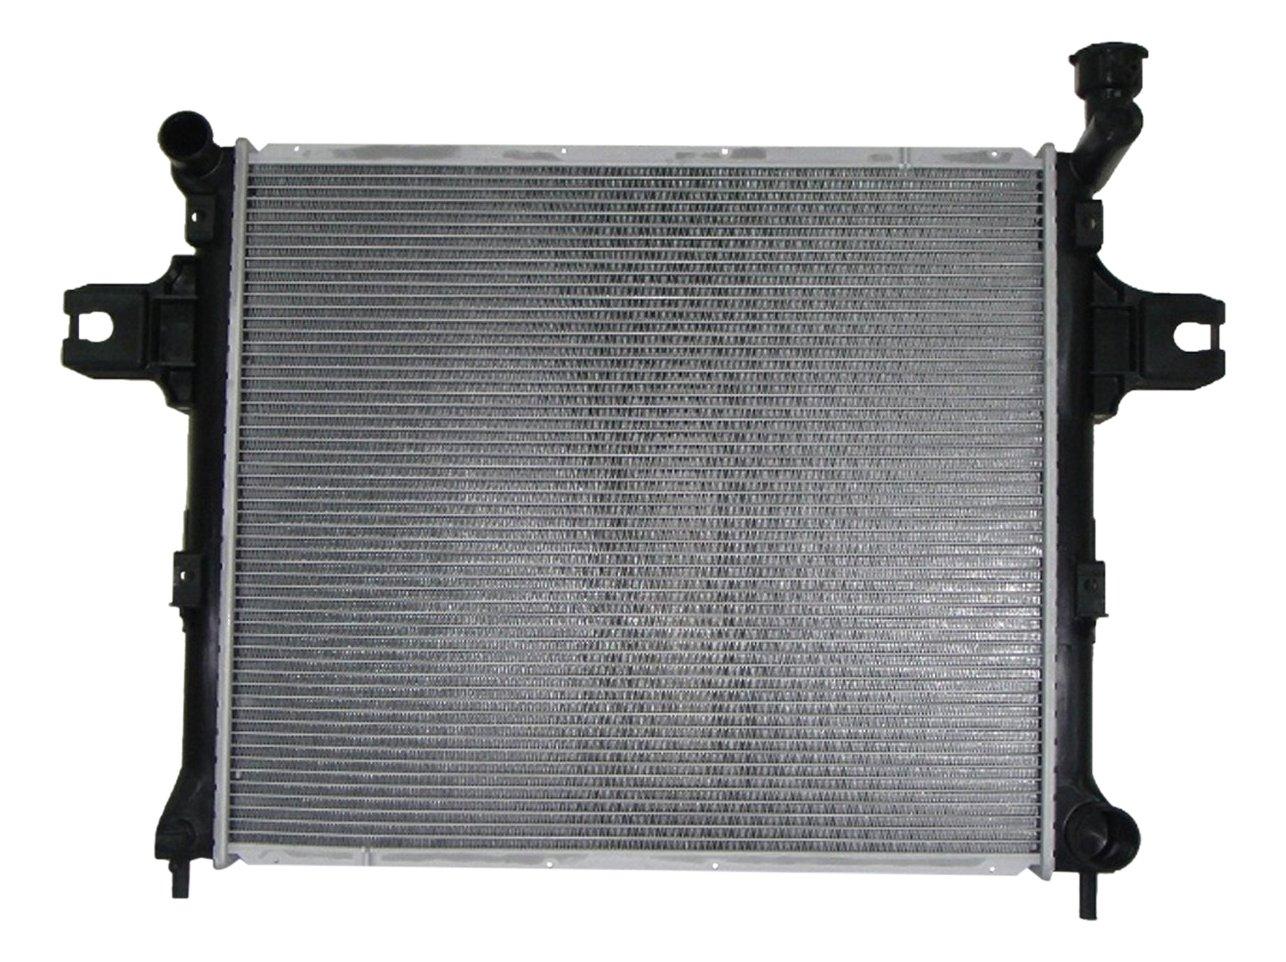 High Quality Amazon.com: Depo 333 56001 000 Radiator (JEEP GRAND CHEROKEE 5.7L V8  05 09/COMMANDER 5.7L V8 06): Automotive